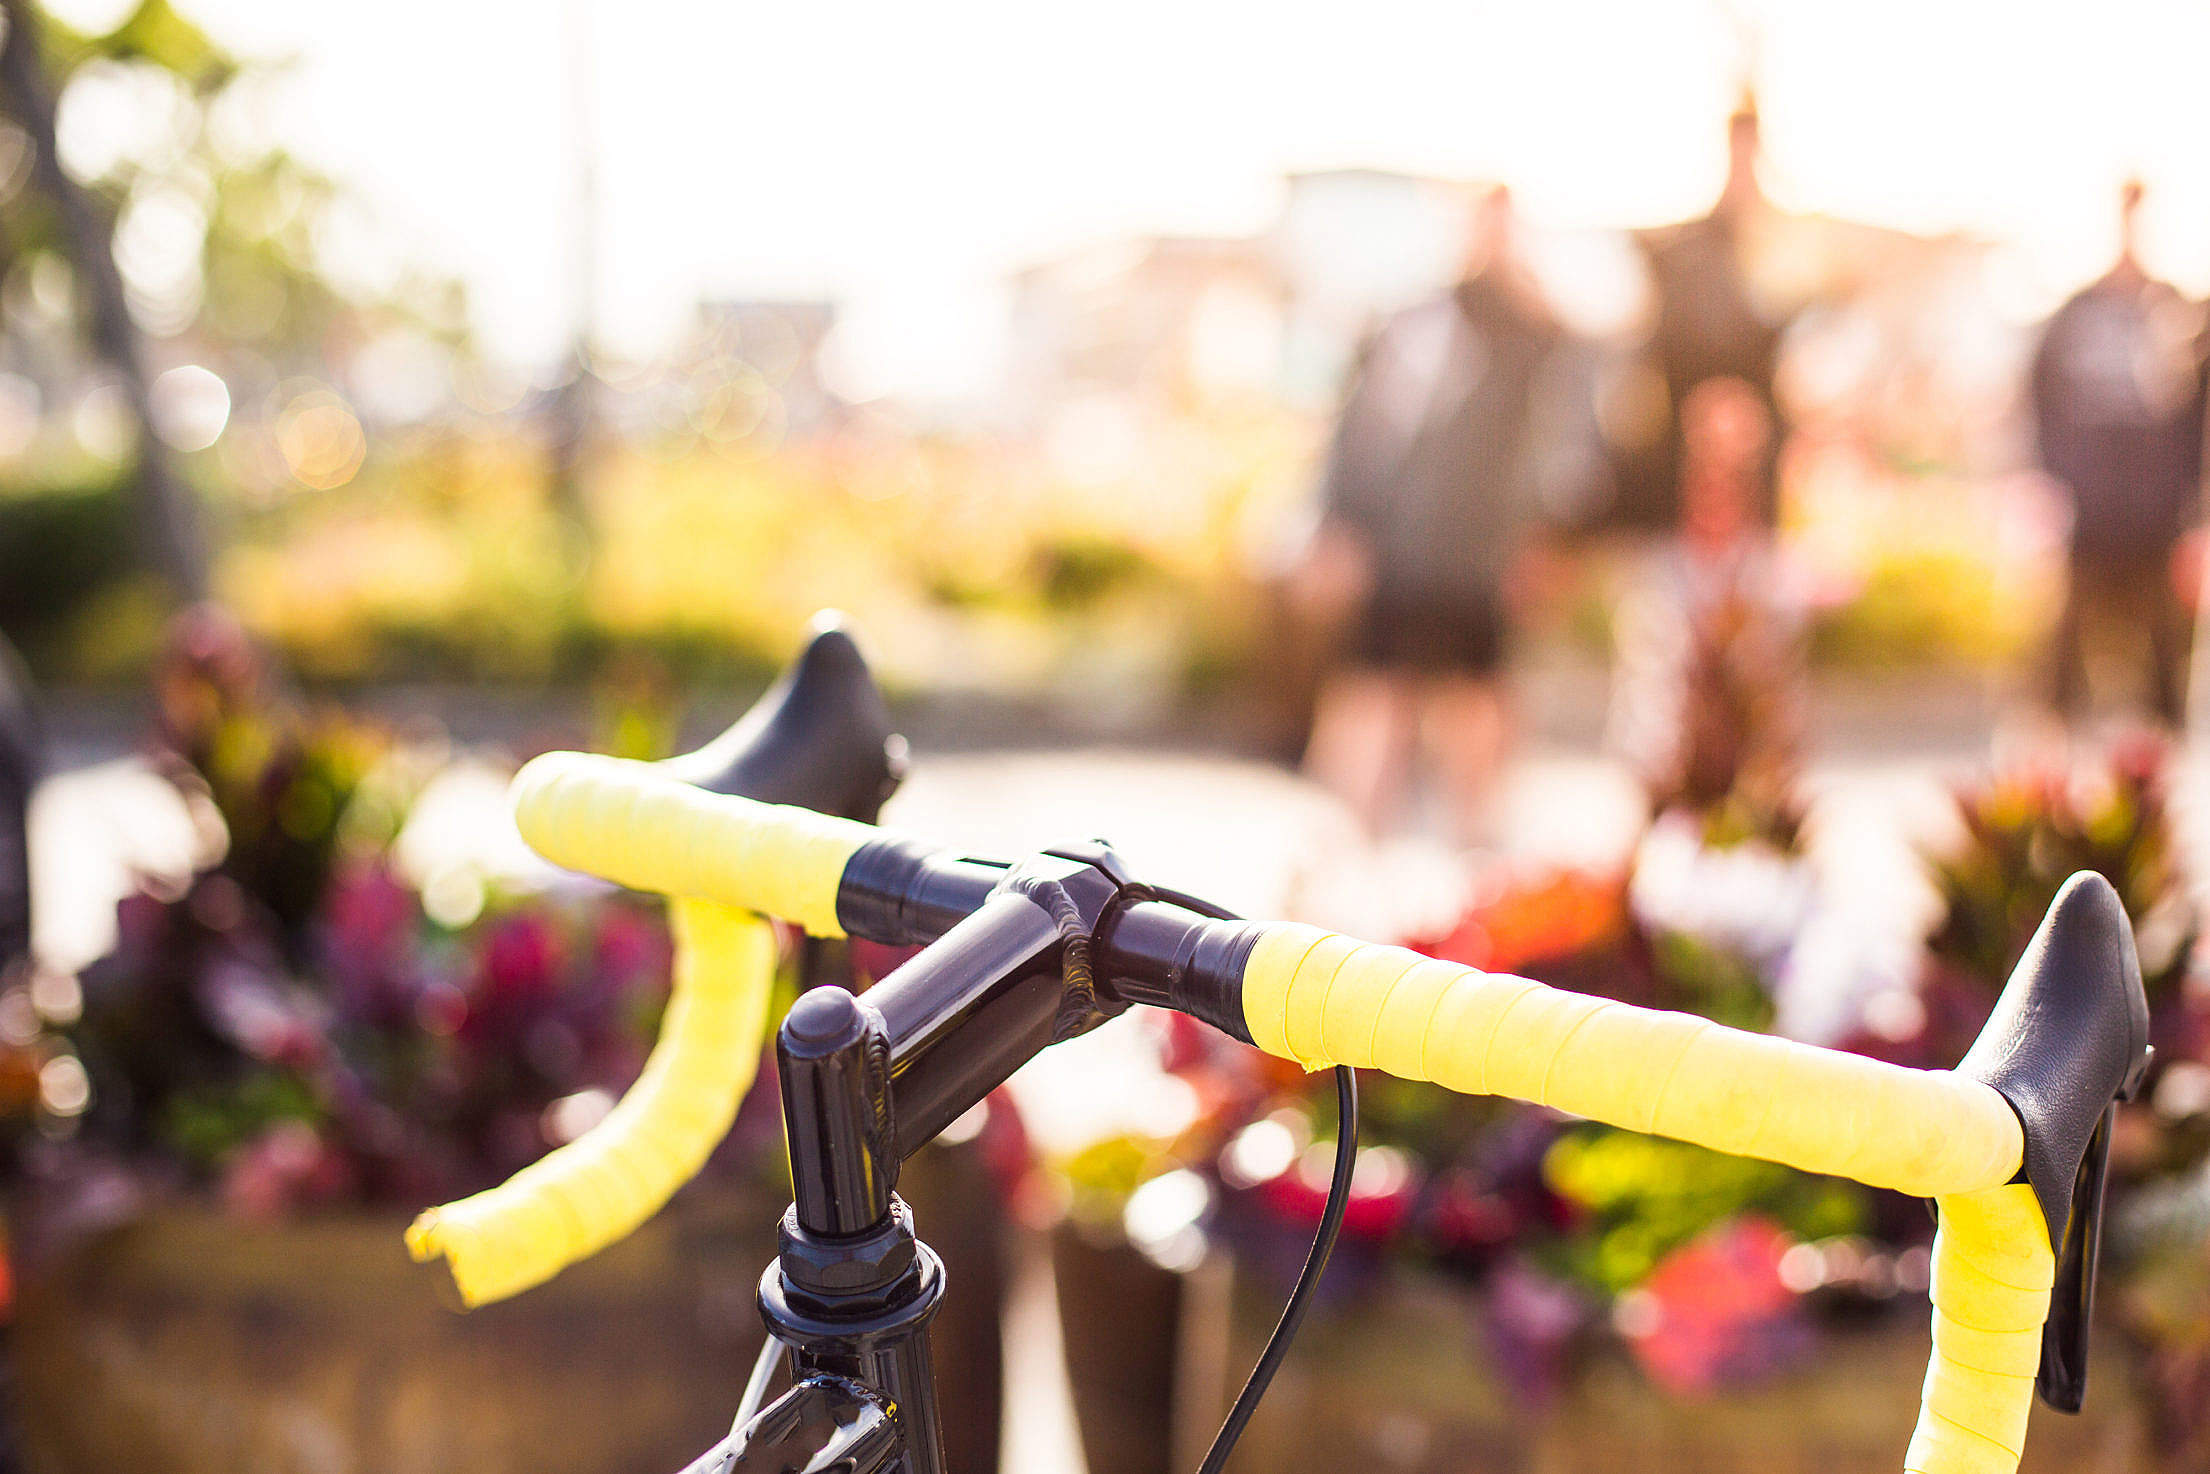 Yellow Bicycle Handlebars Close Up Free Stock Photo